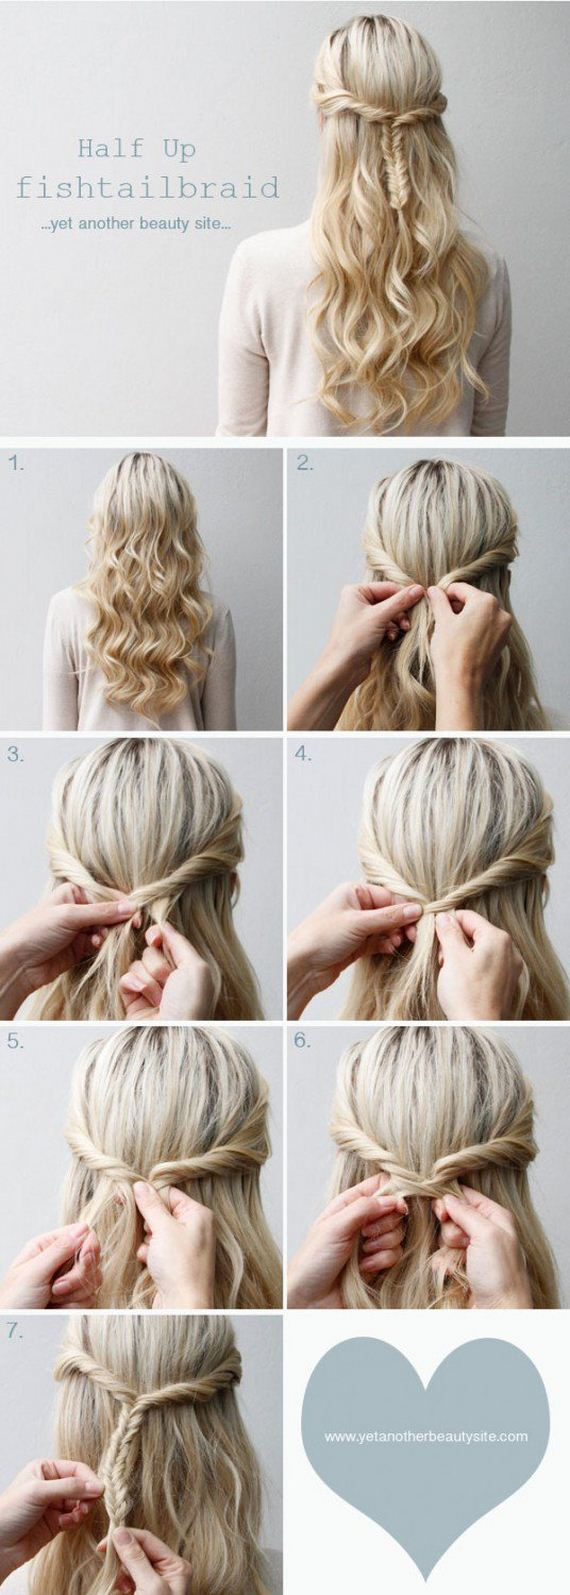 13-DIY-Hairstyles-for-Long-Hair